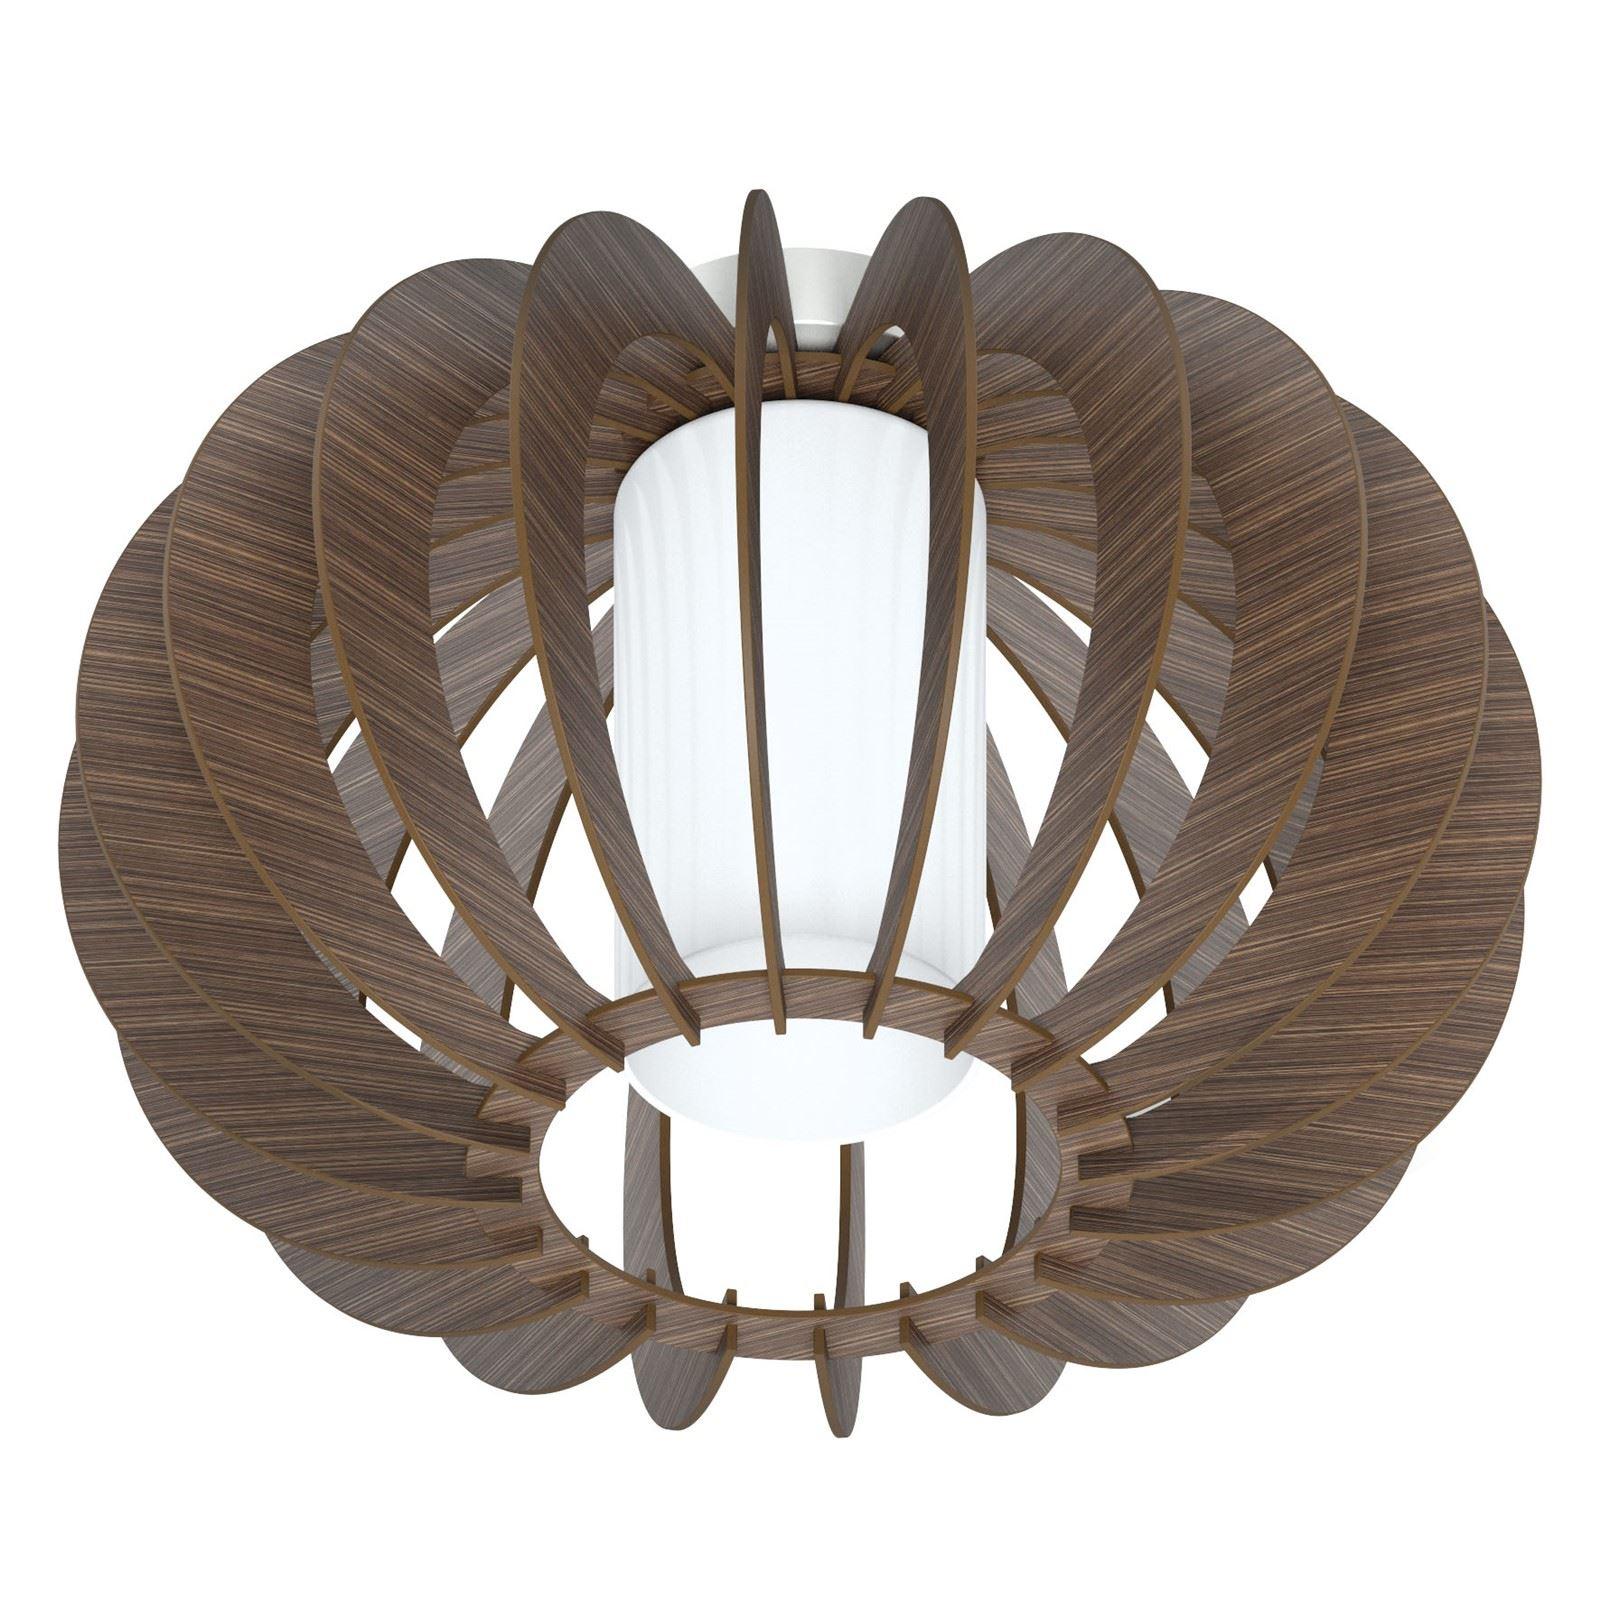 STELLATO 1 Light Ceiling Lighting White Glass Brown Wood Shade